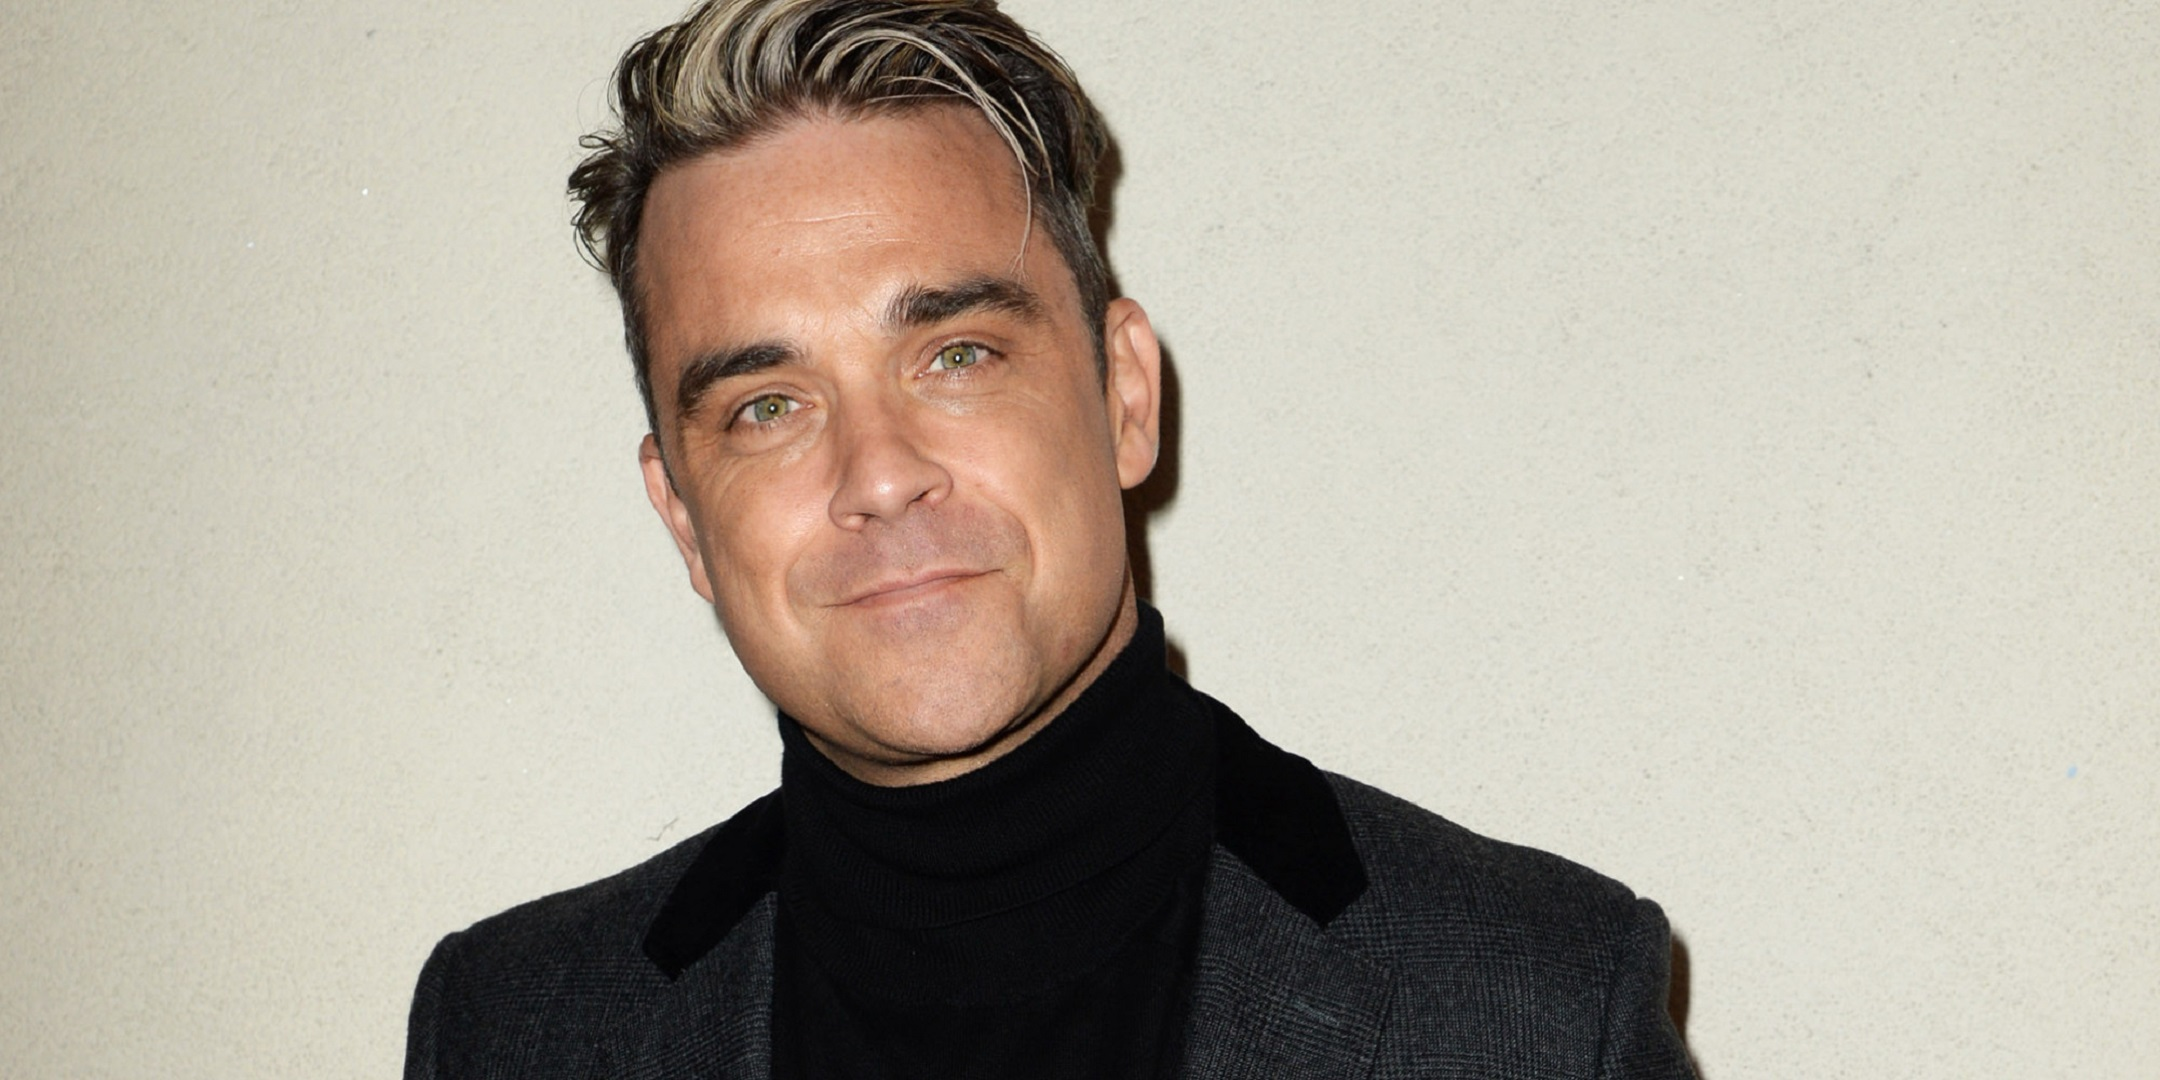 Robbie Williams Wallpapers Hd